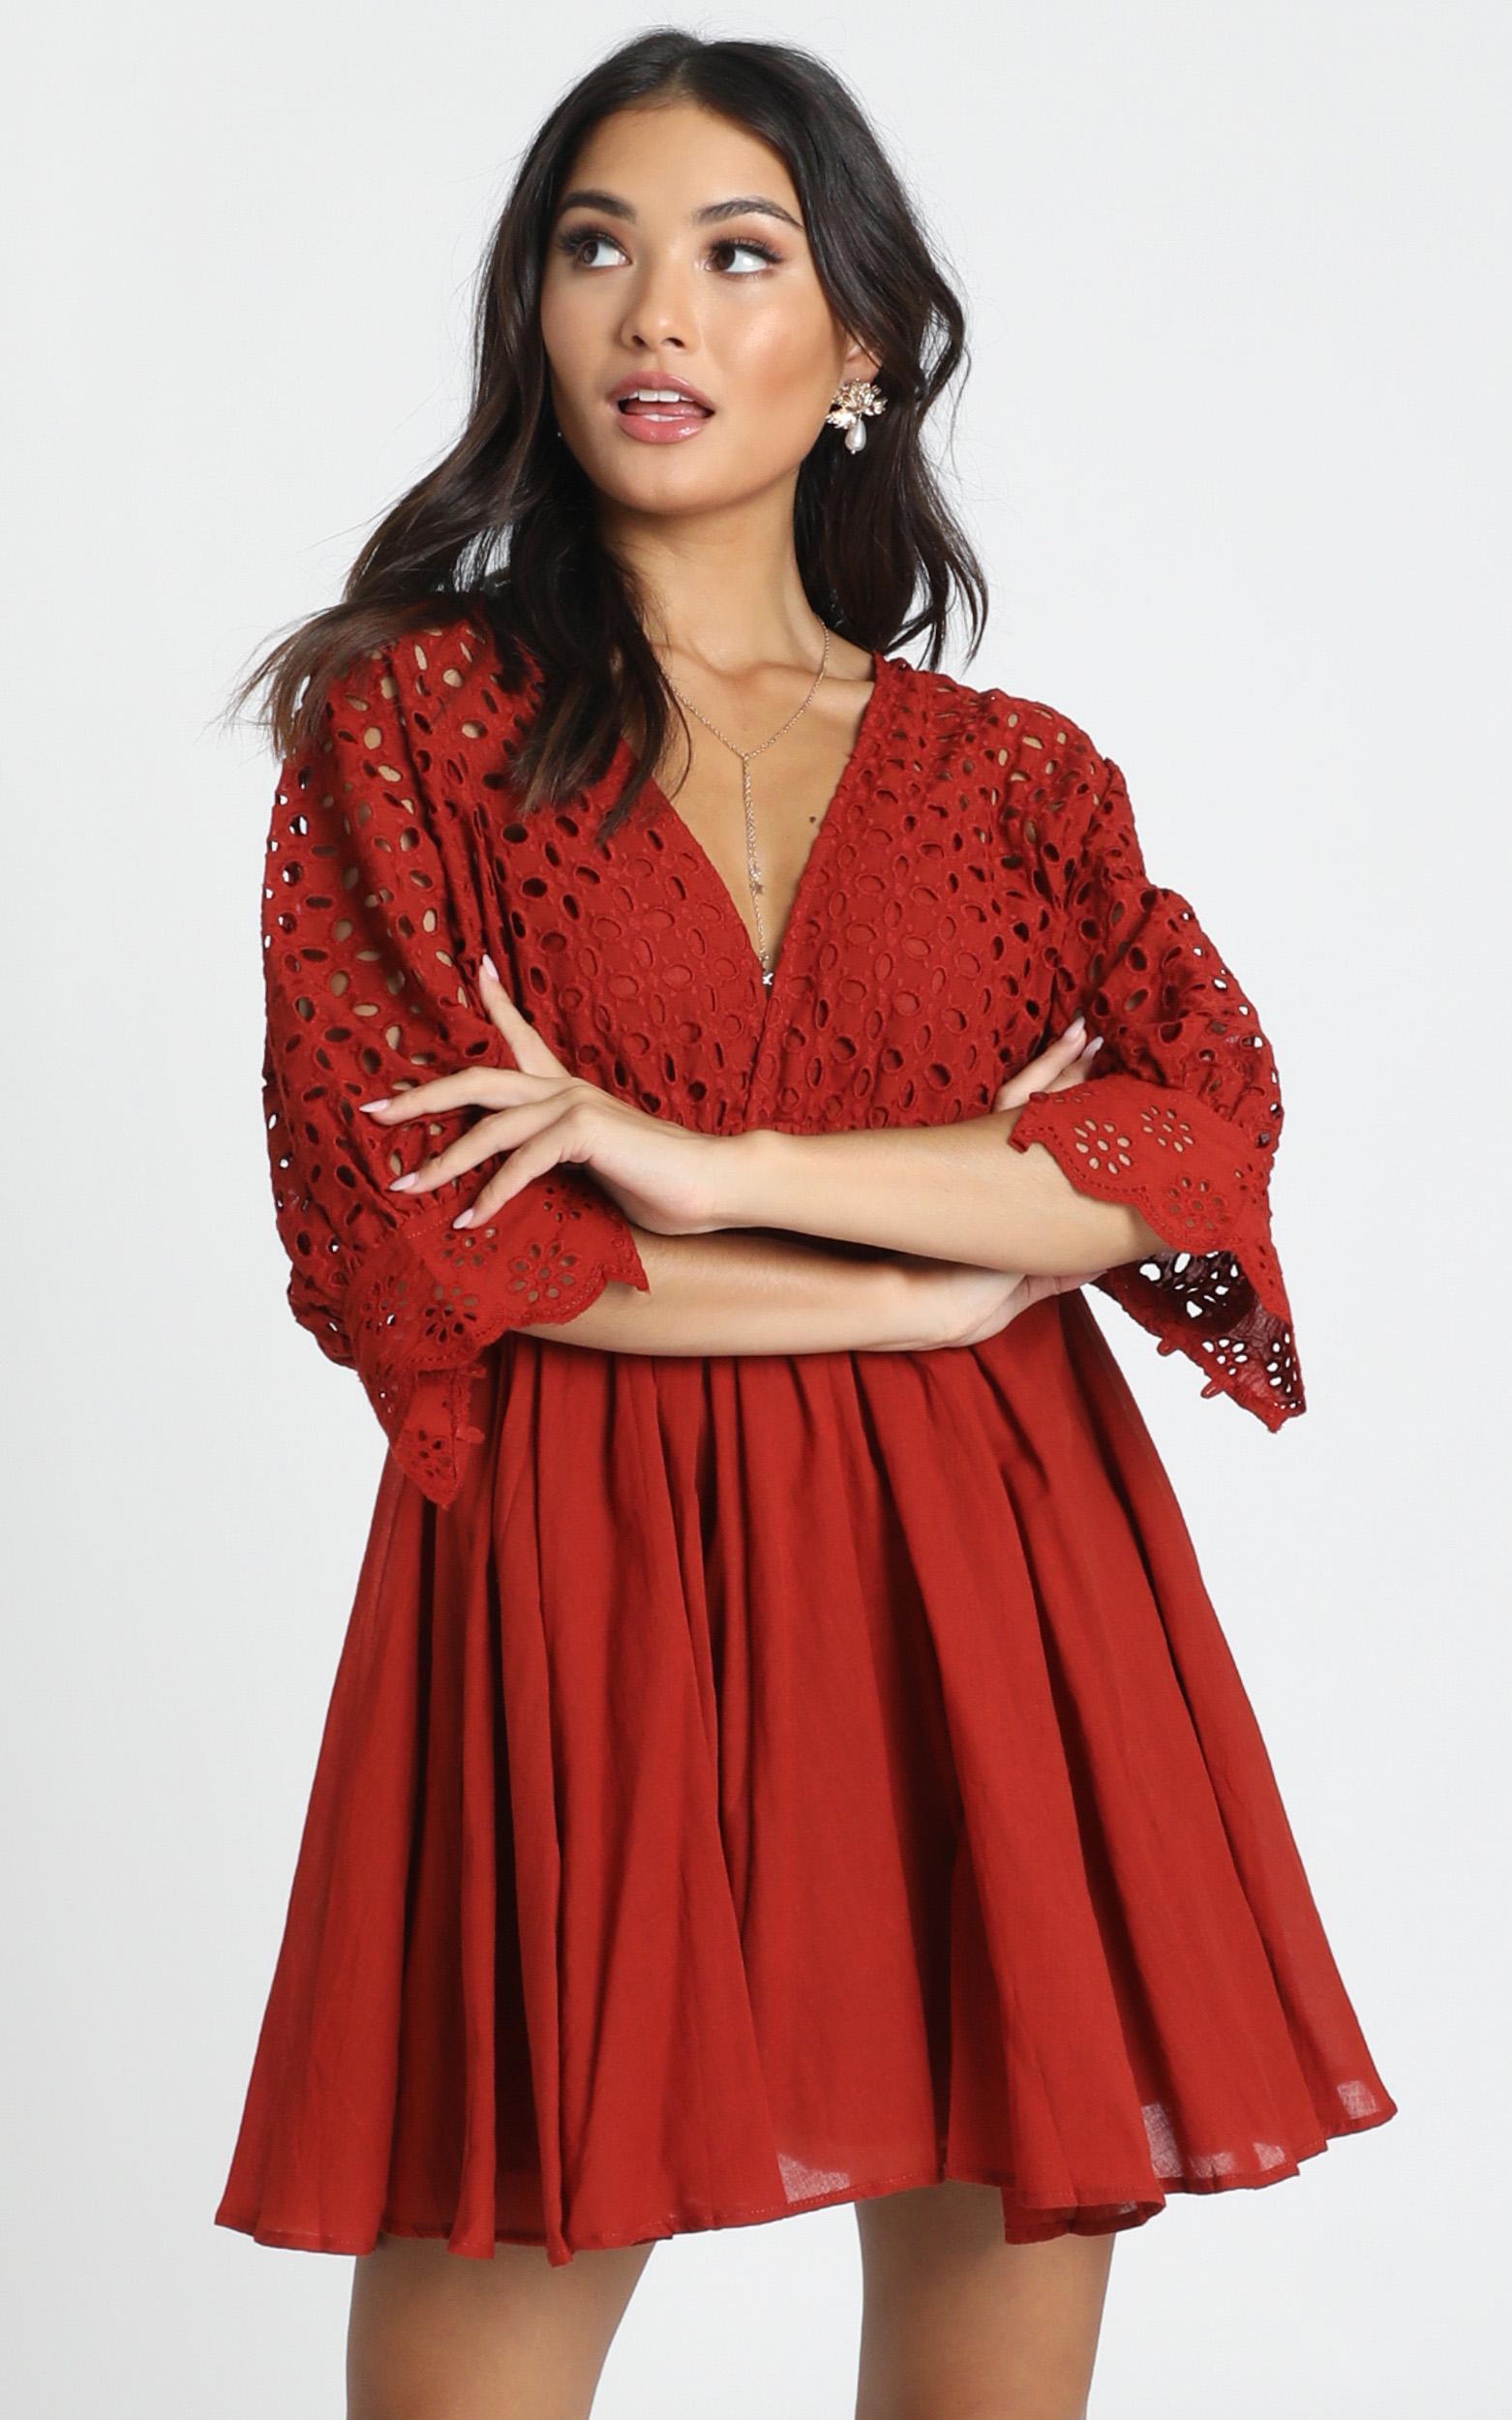 Jacinta V-Neck Embroided Mini Dress in rust - 12 (L), Rust, hi-res image number null